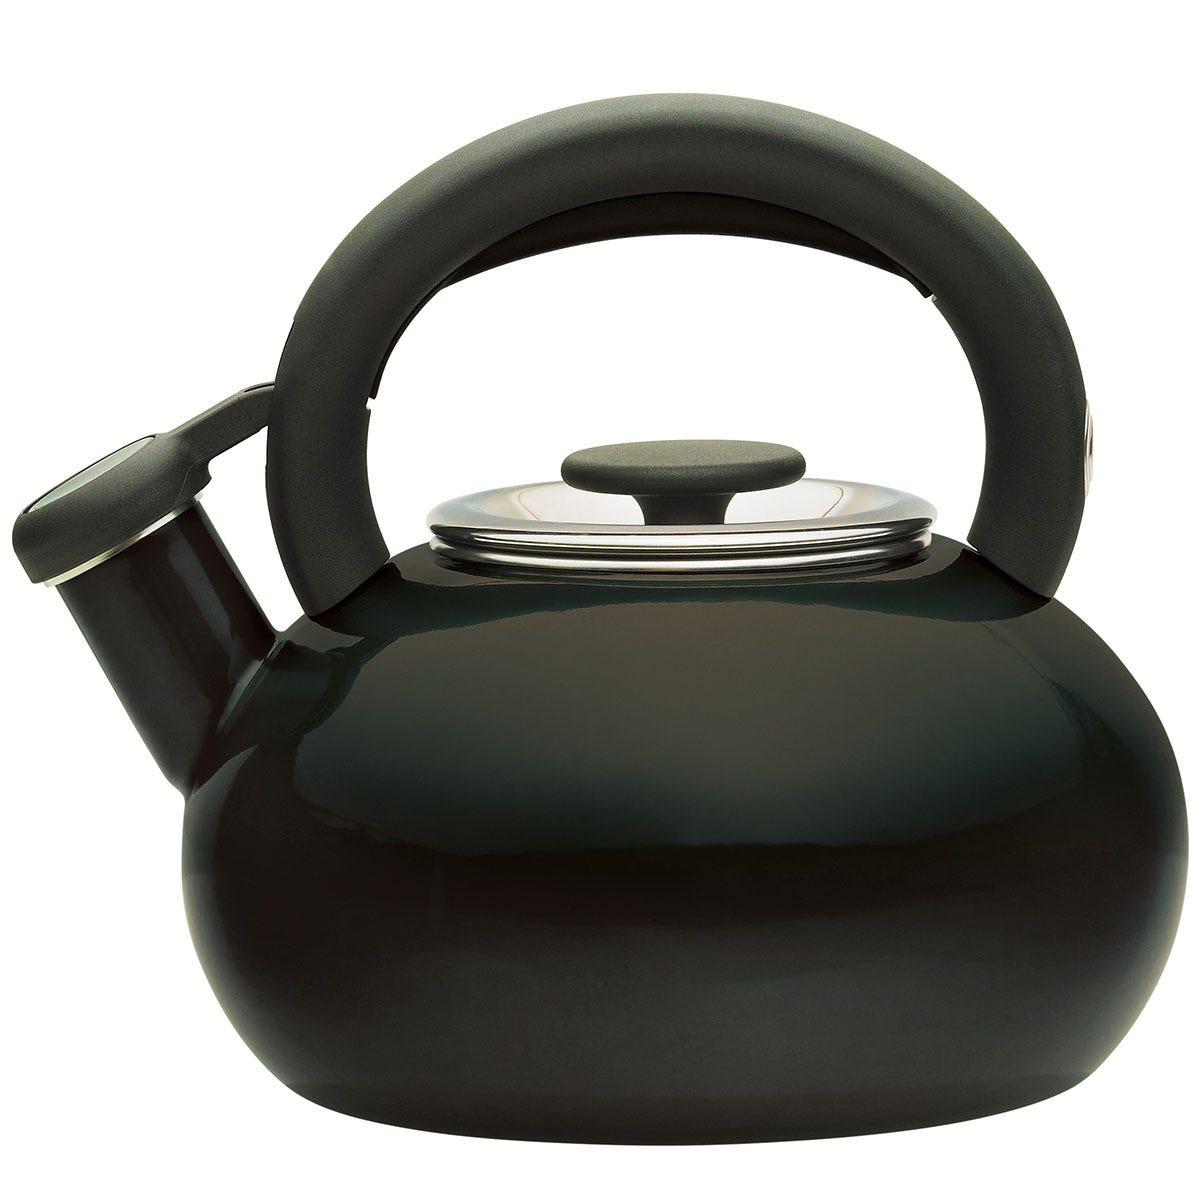 Prestige Black Stove Top Kettle - 1.4L